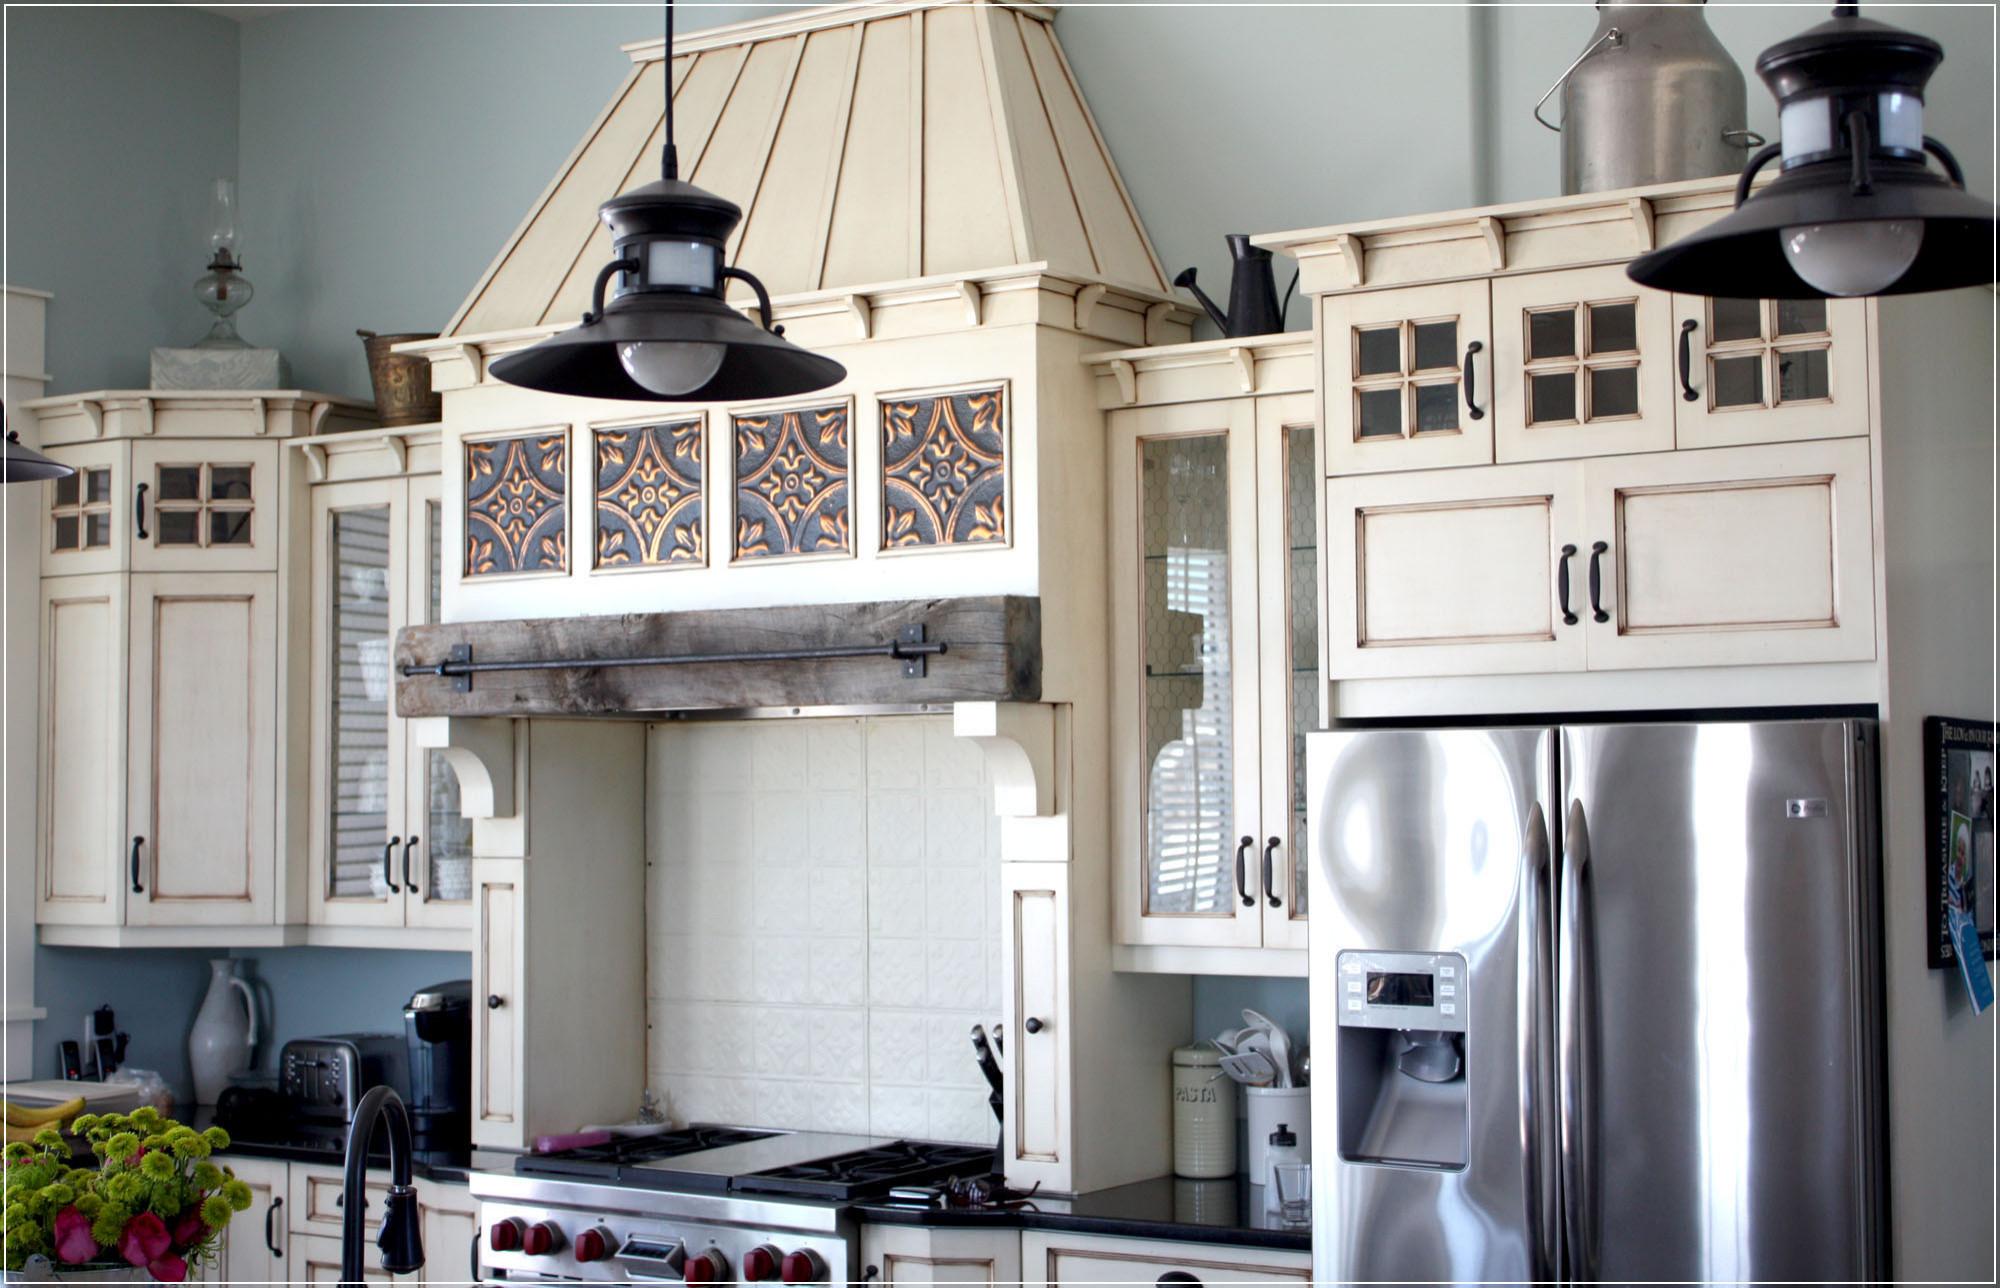 Black and White Arts & Crafts Kitchen